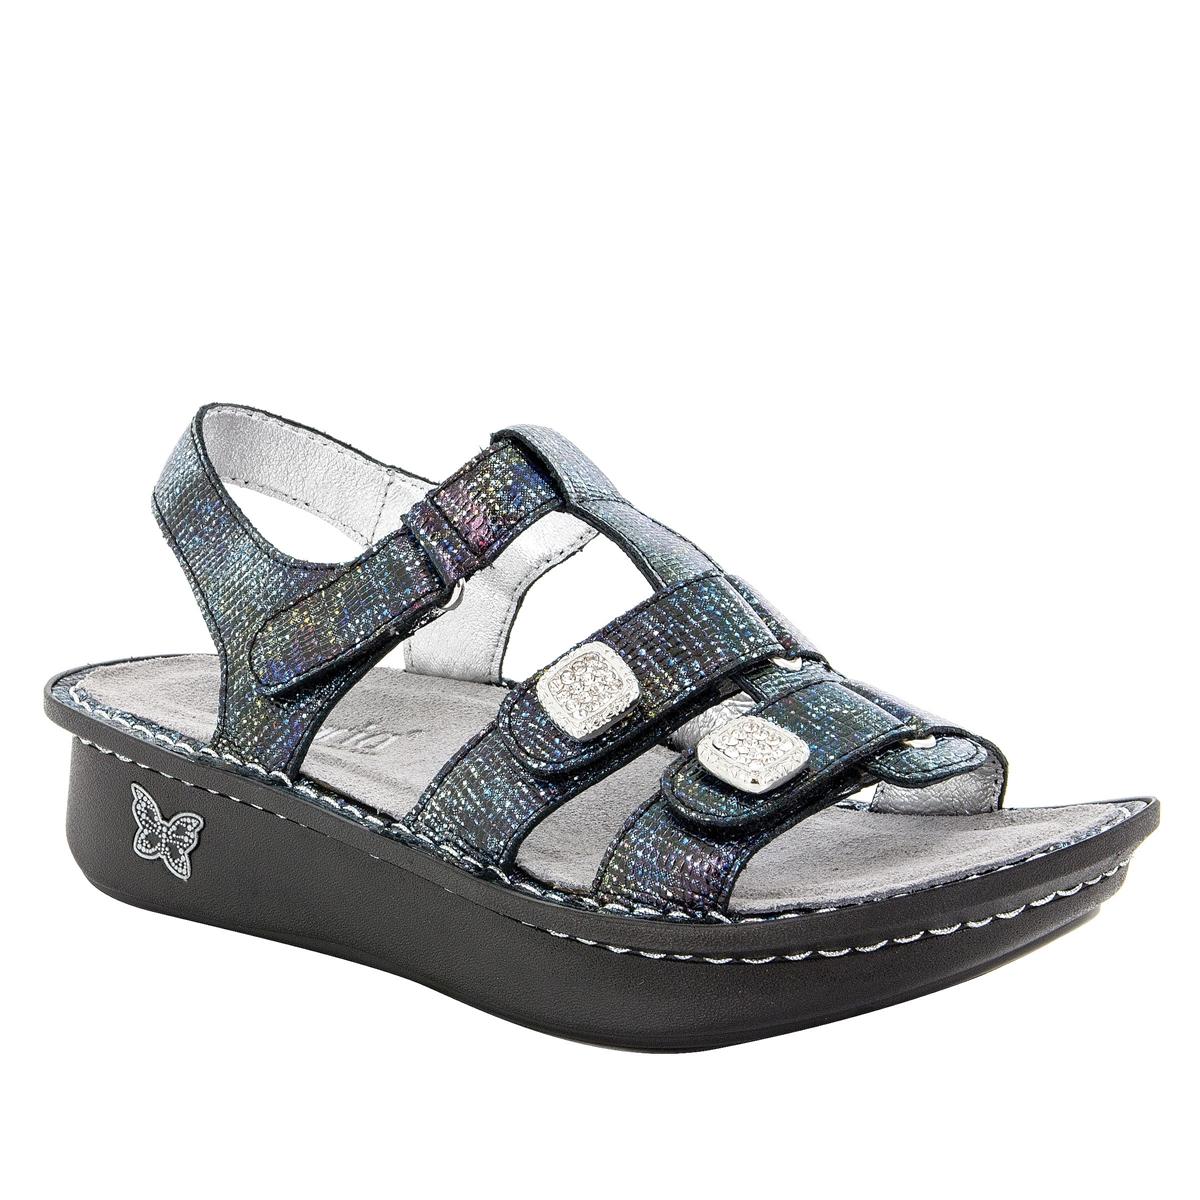 9b54ba96315 Kleo Glimmer Glam Sandal - Alegria Shoes